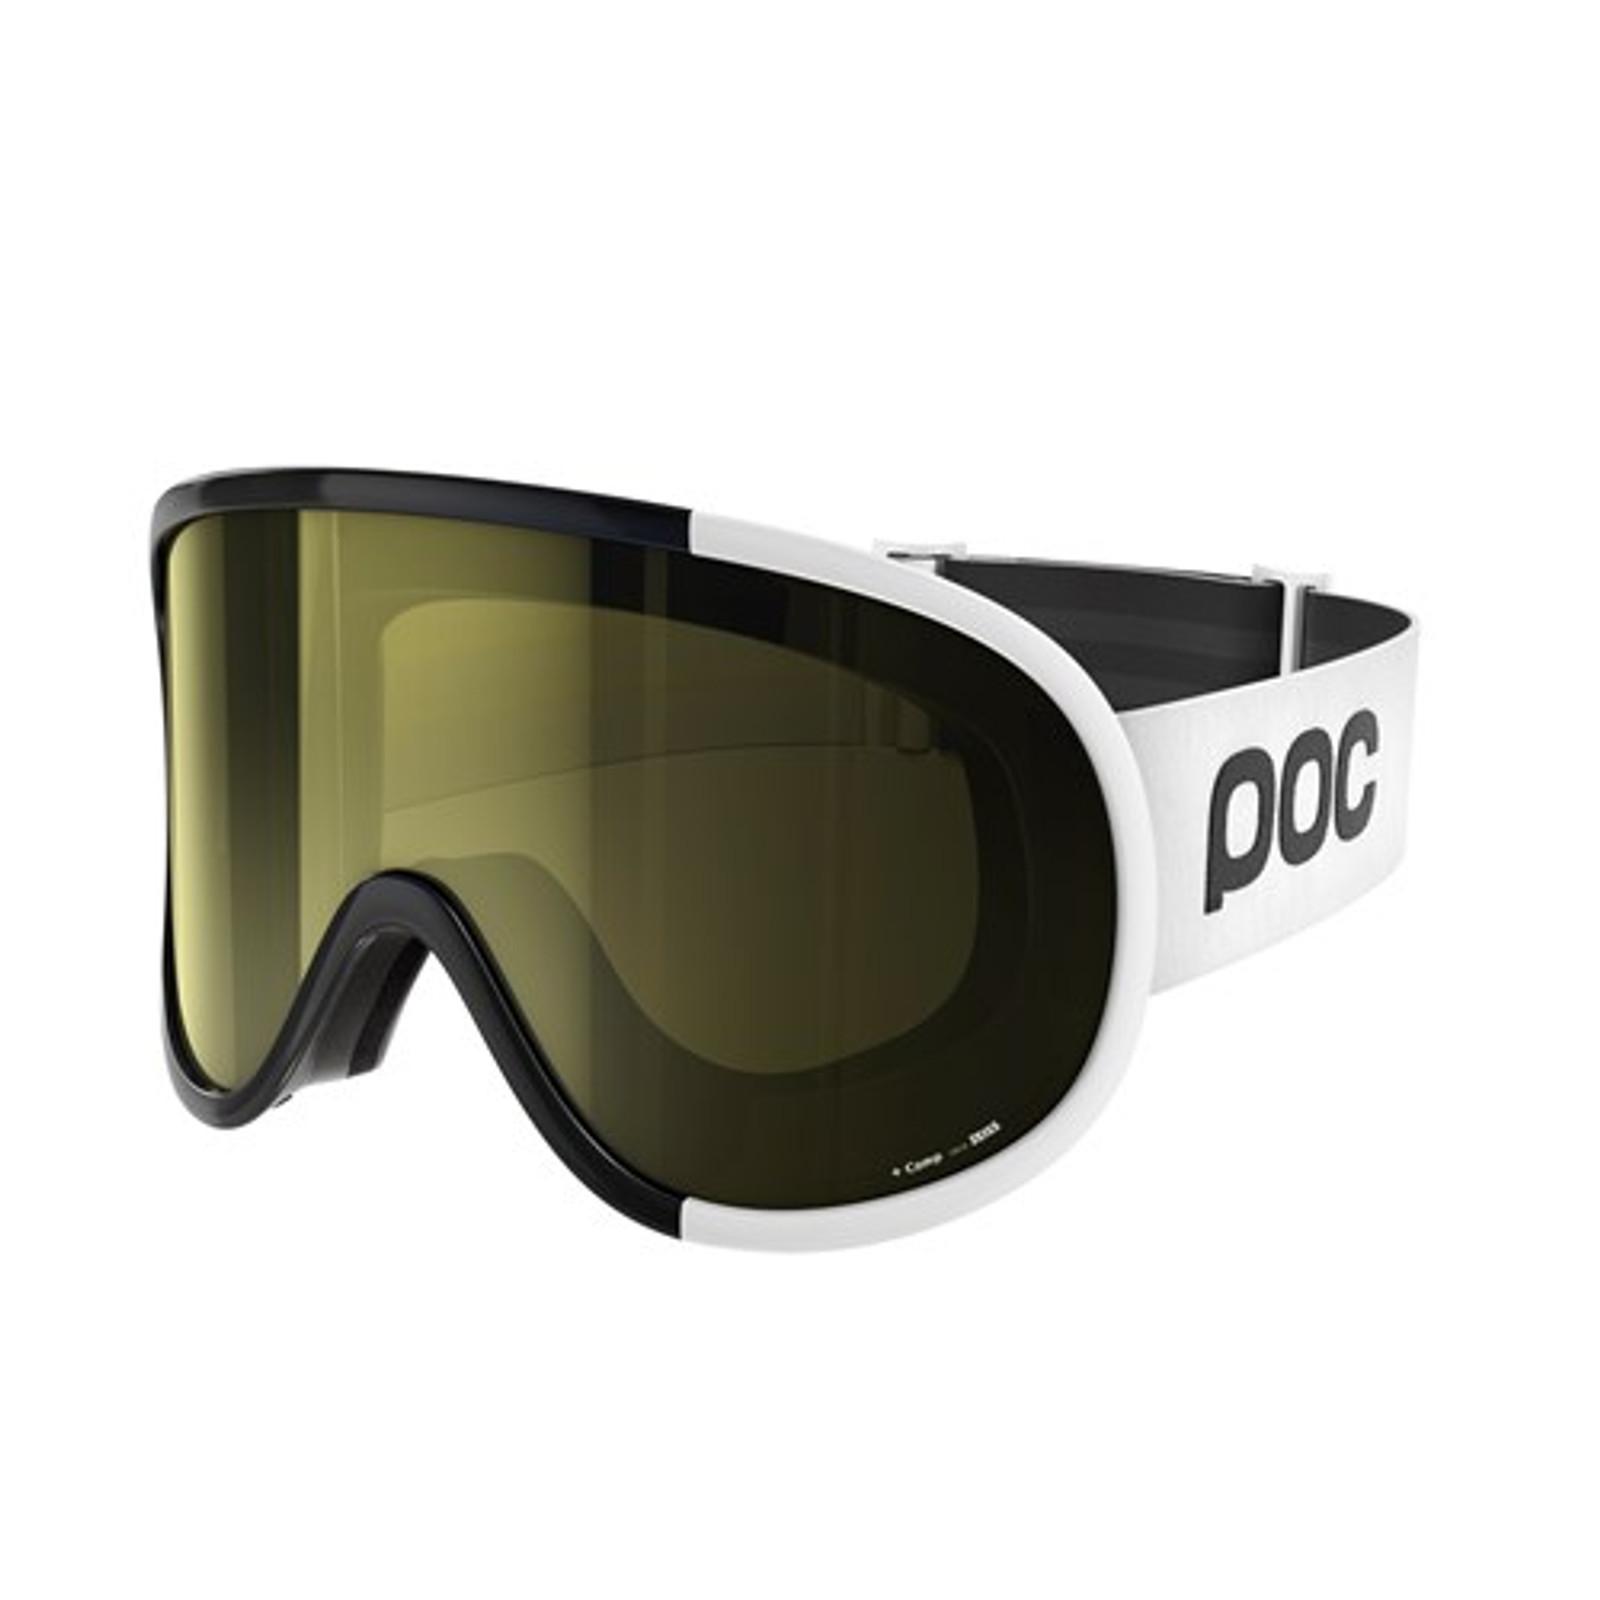 POC Retina Comp Goggles - Uranium Black